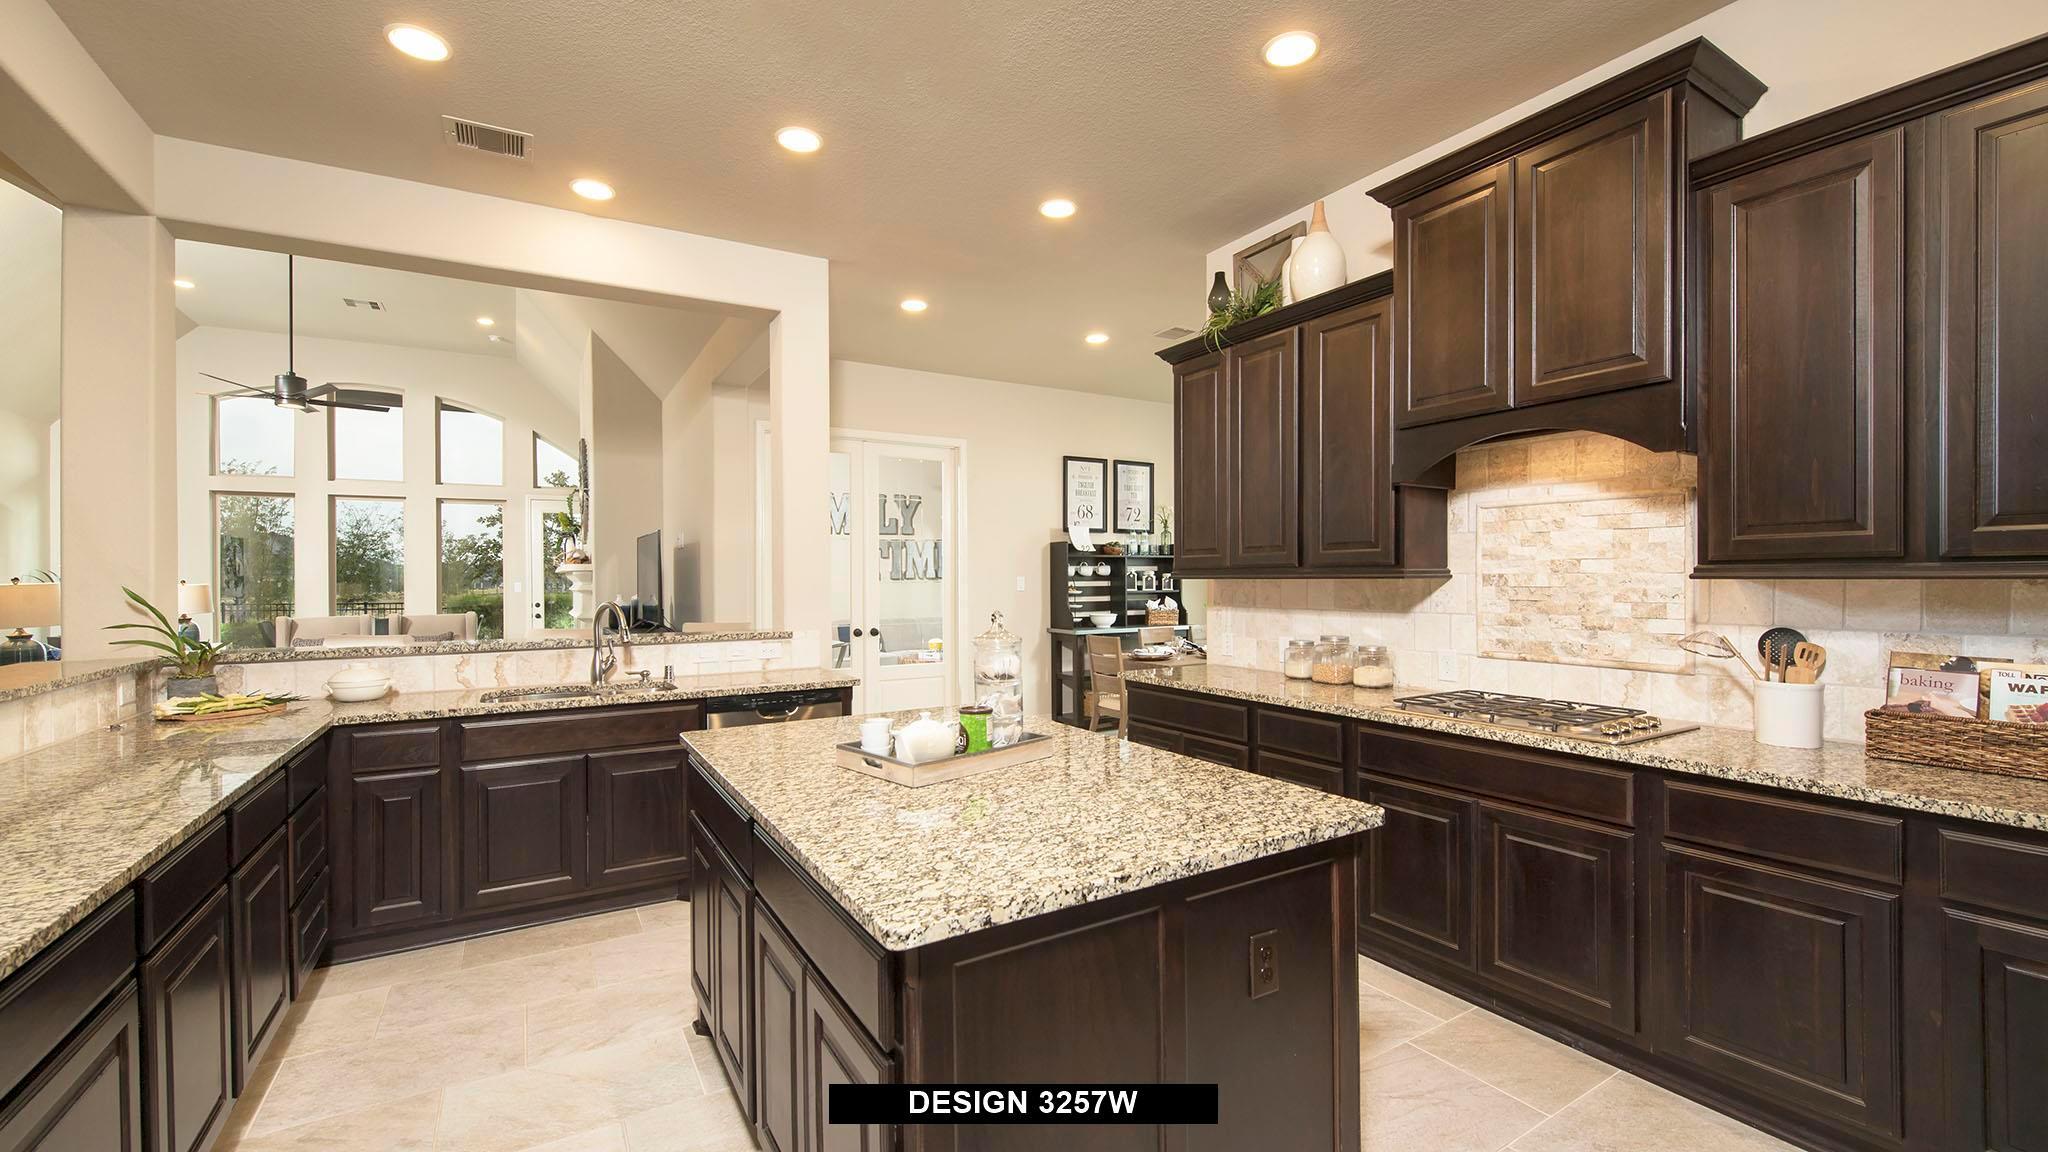 Kitchen-in-3257W-at-Lilyana 60'-in-Prosper